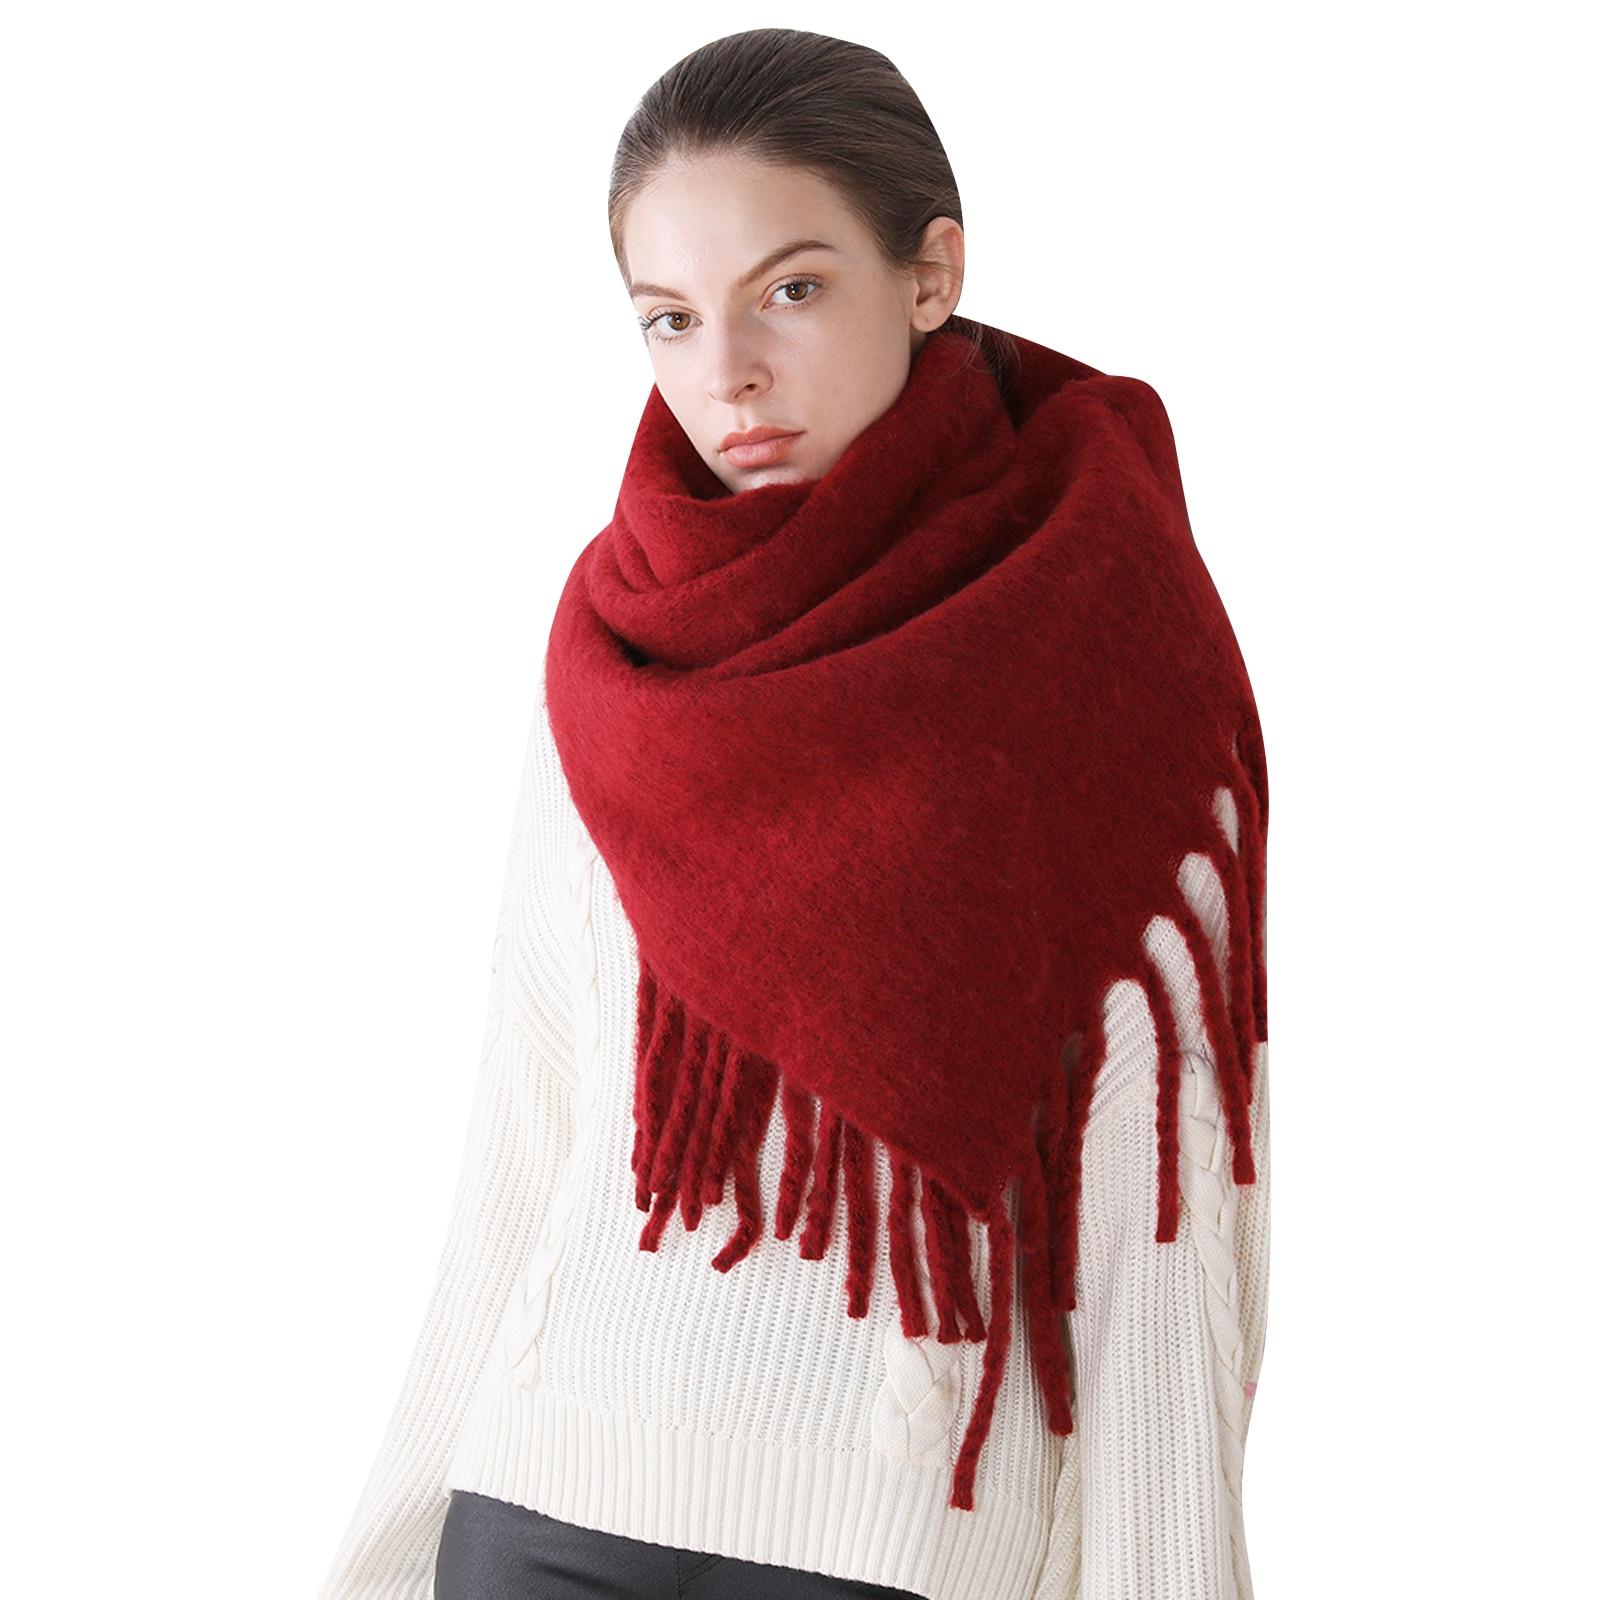 2020 Women Scarf Shawls Wraps Lady Solid Female Head Scarves Wrap Blanket Warm Wholesale Autumn Winter Foulard Thick Blanket